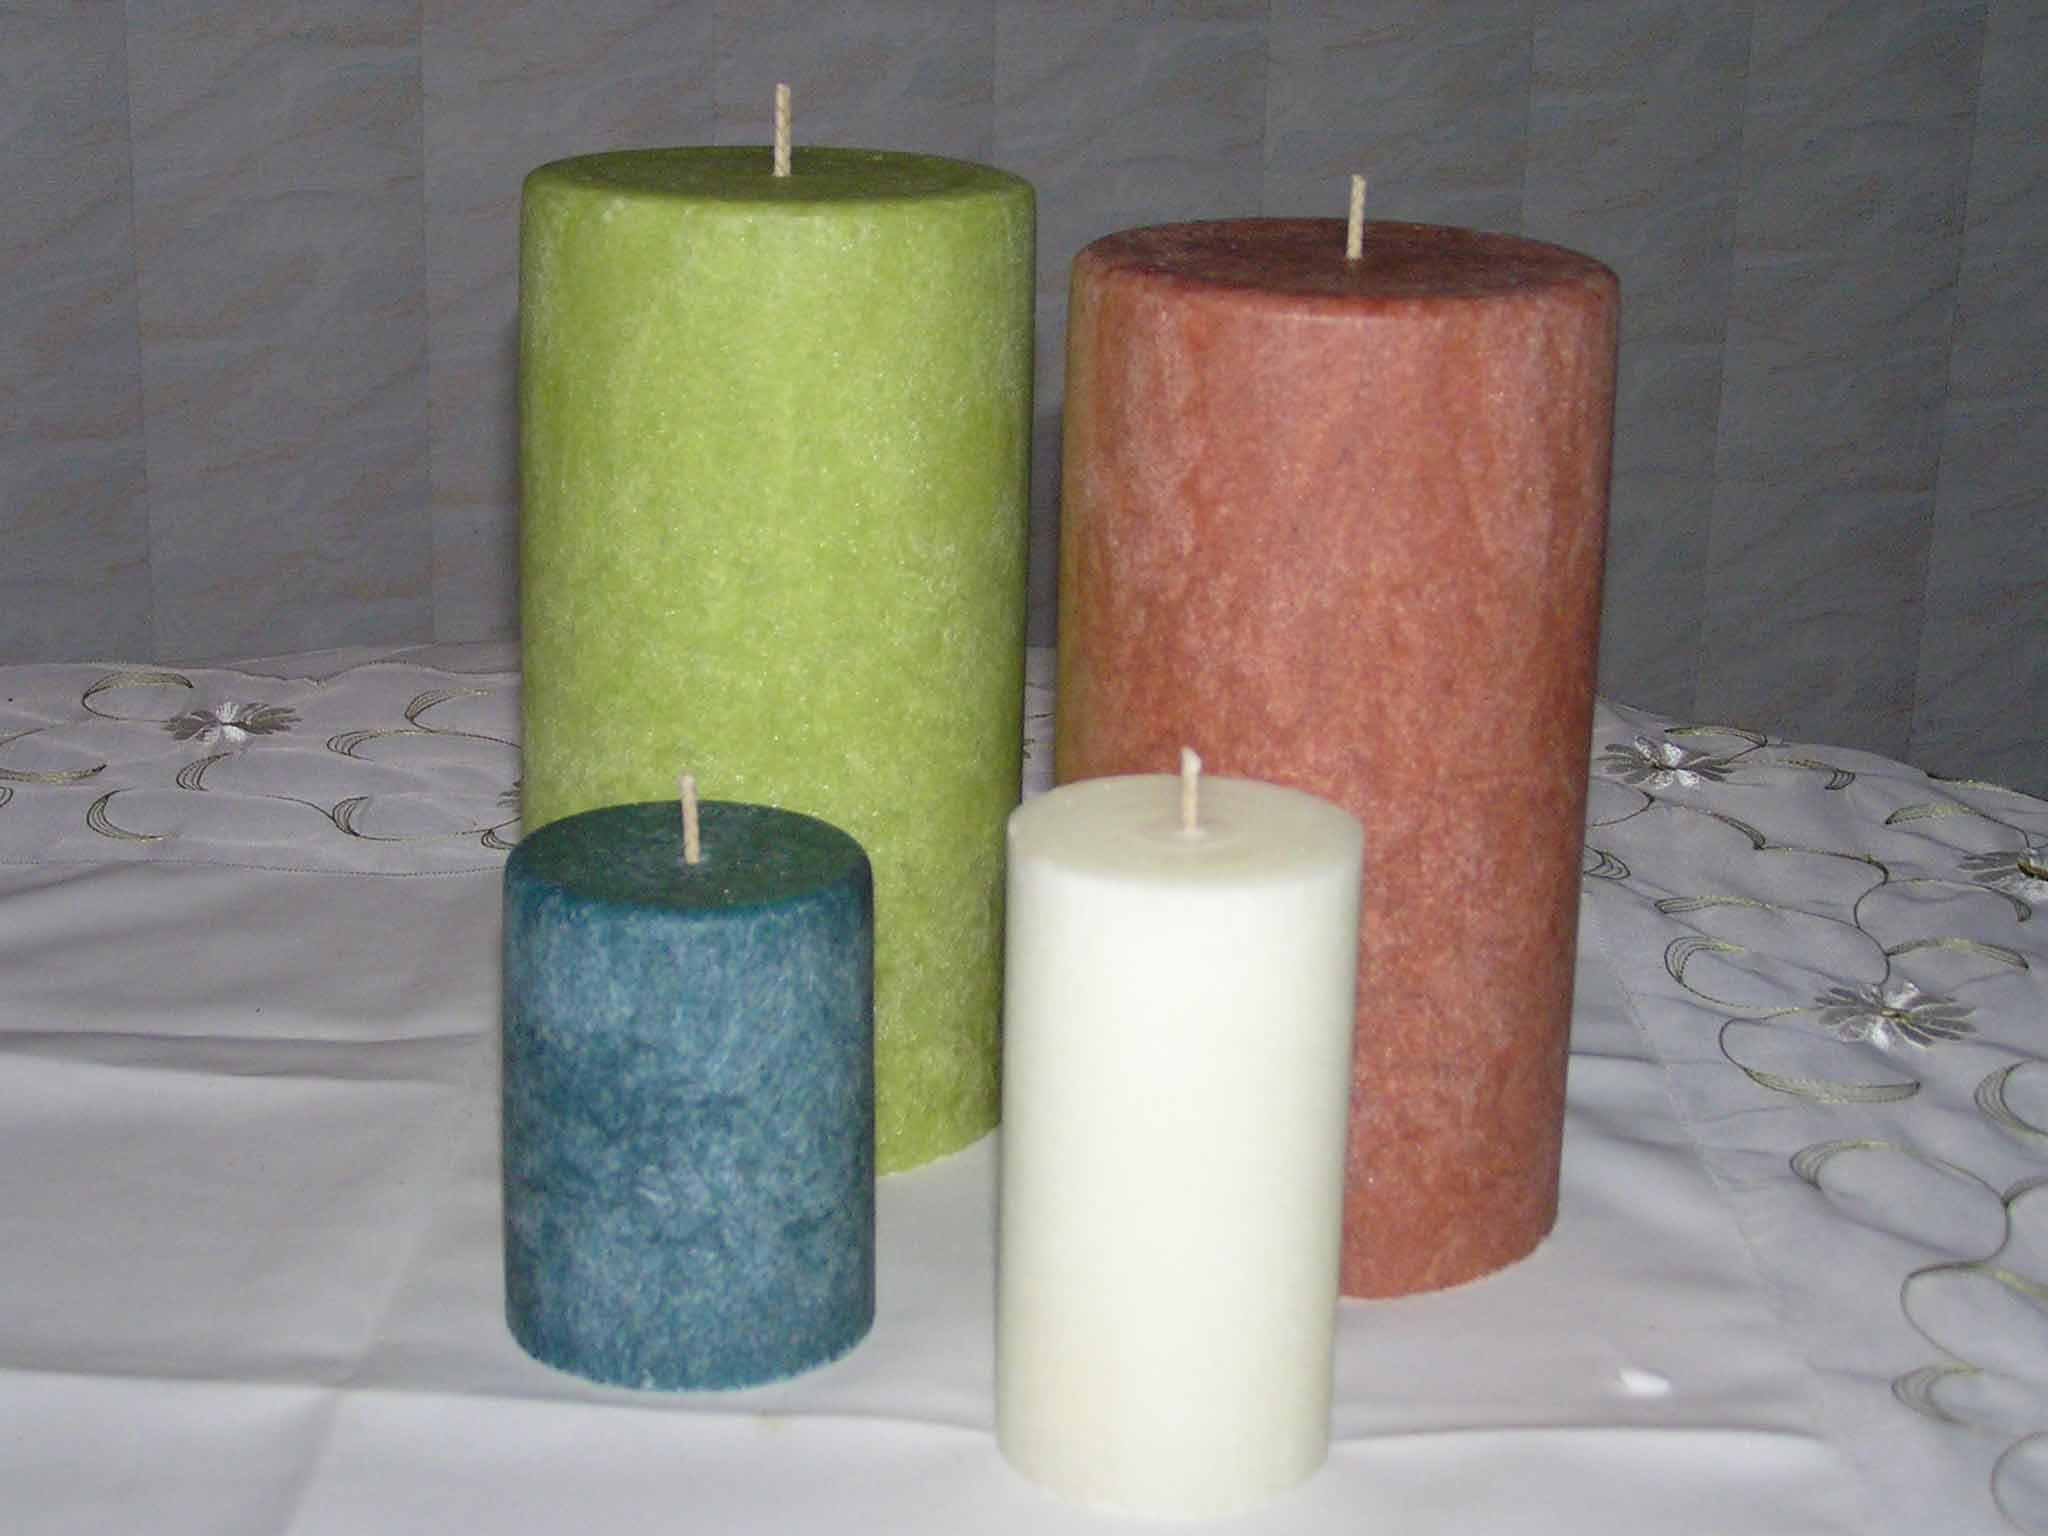 Soy Pillar Candles